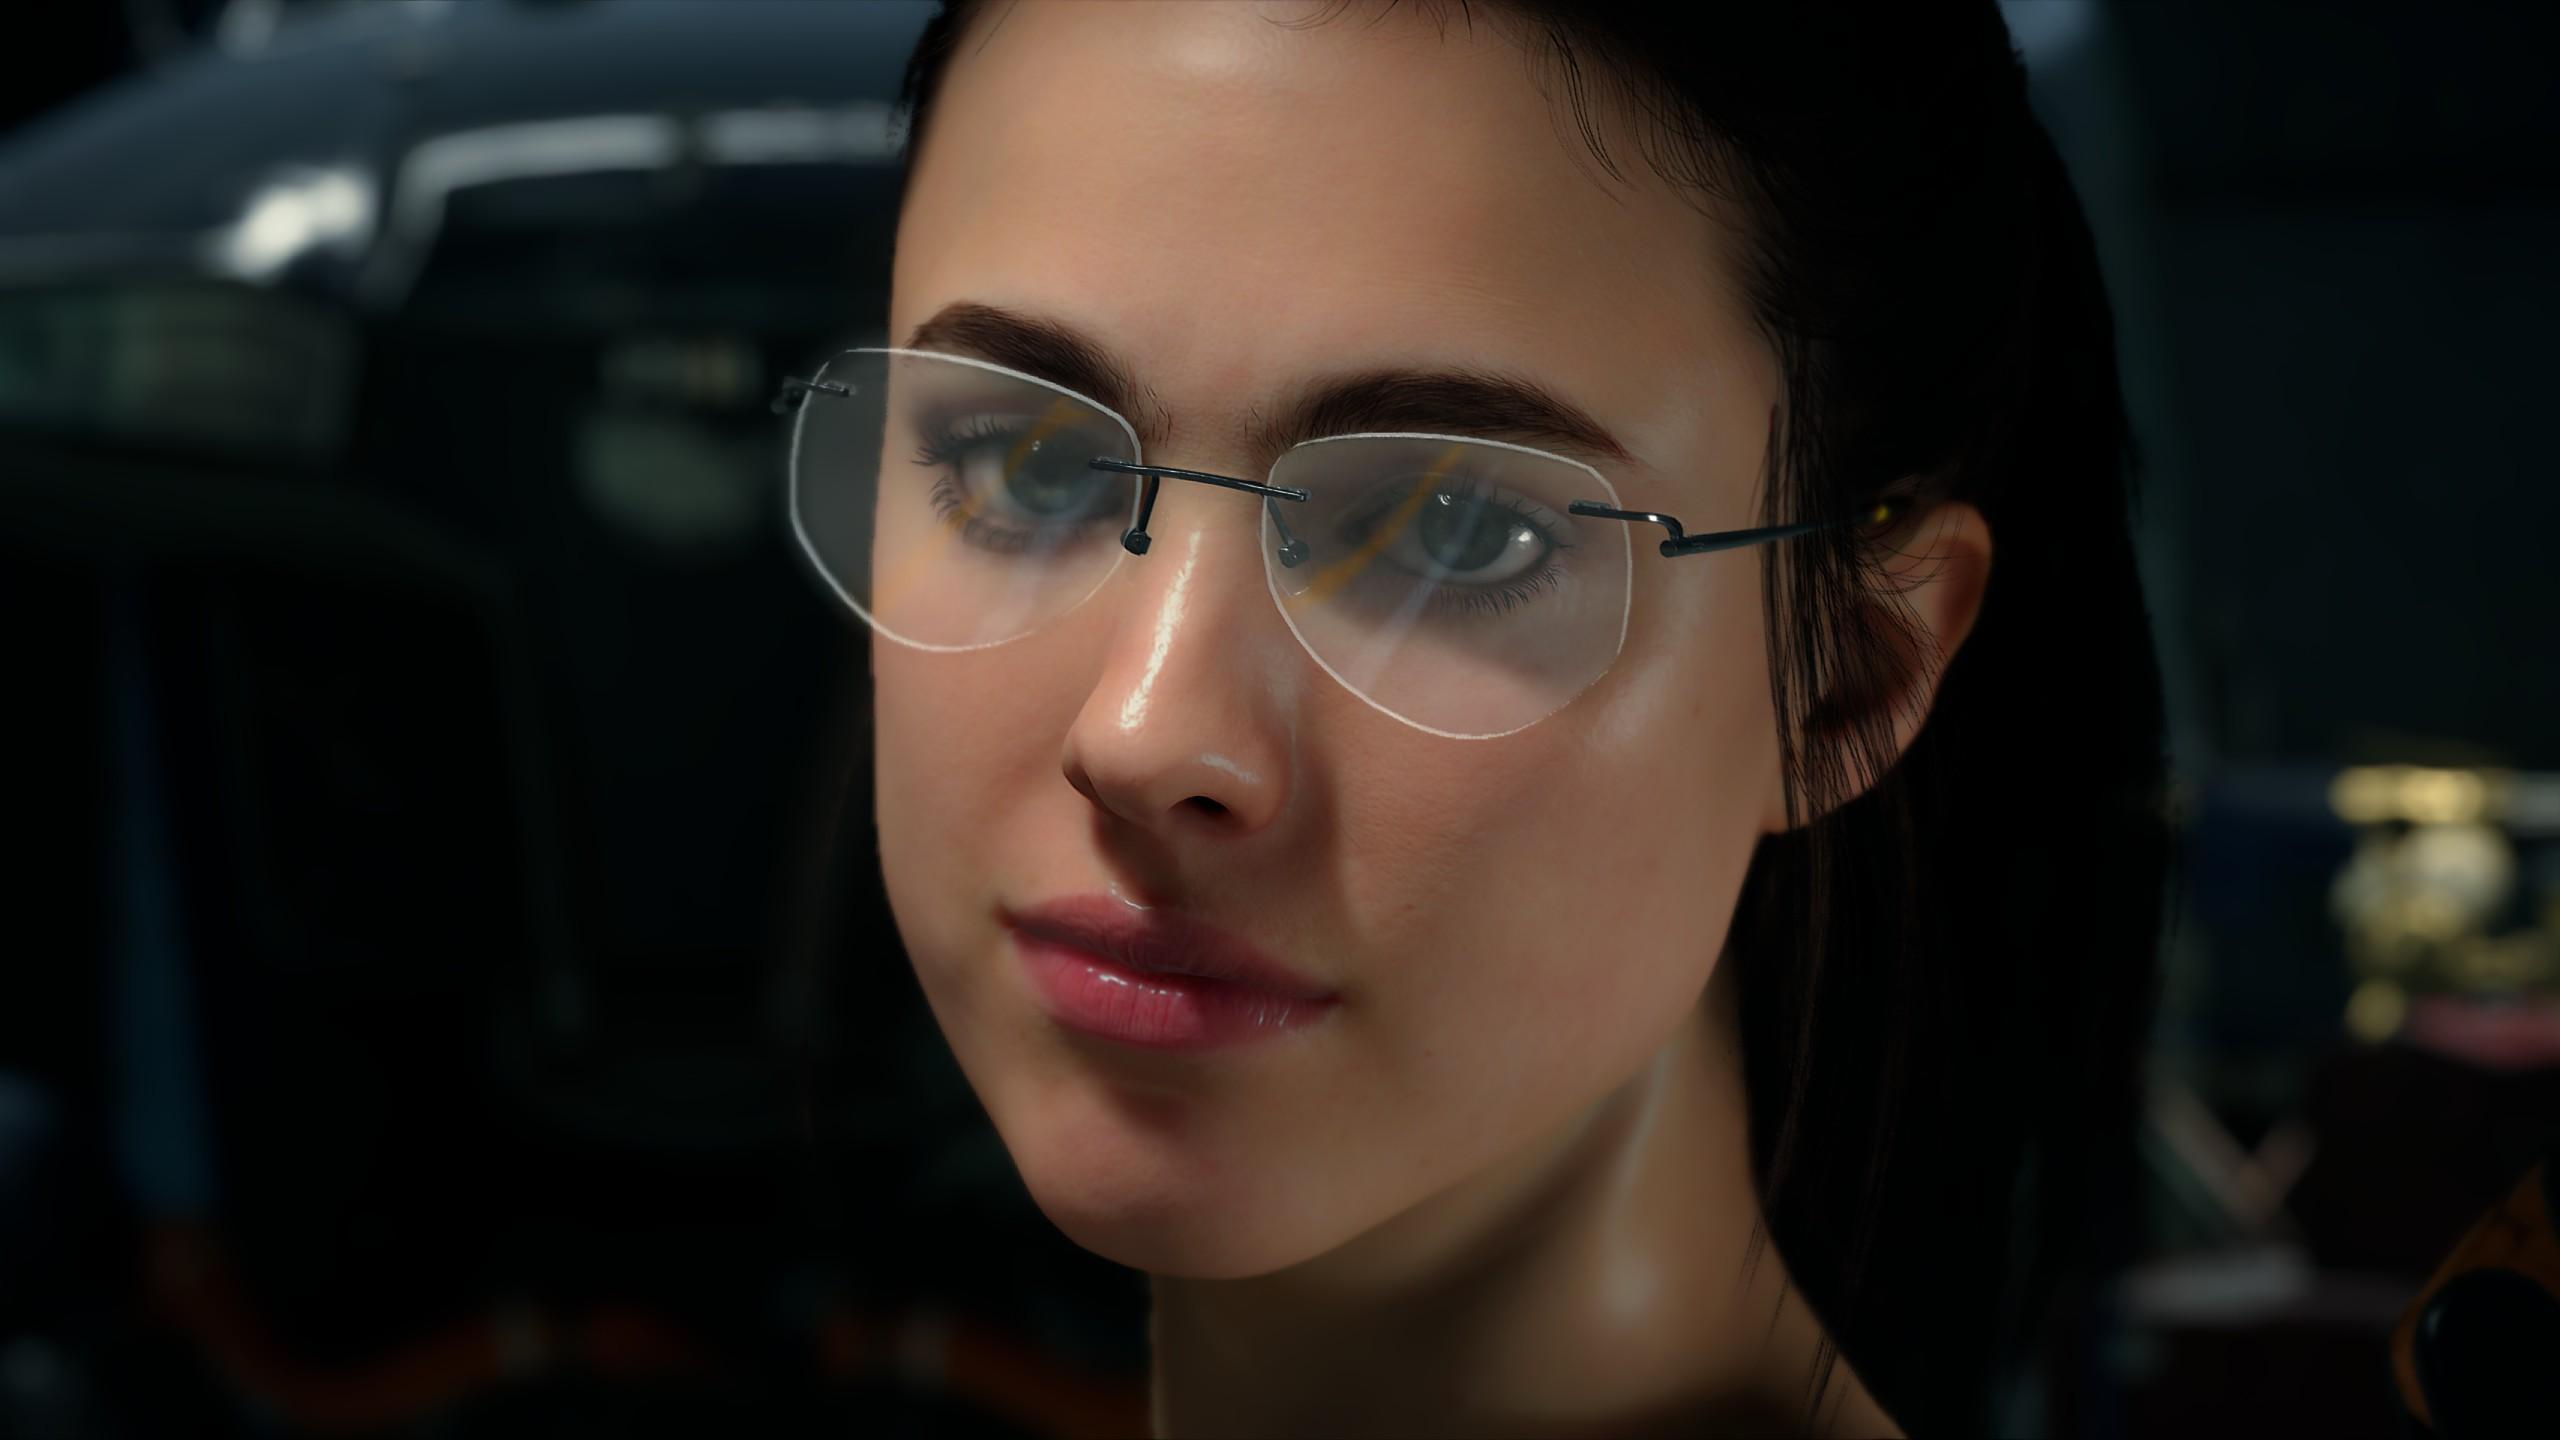 General 2560x1440 Death Stranding Mama (Death Stranding) Margaret Qualley screen shot video game art Hideo Kojima dark hair glasses women with glasses